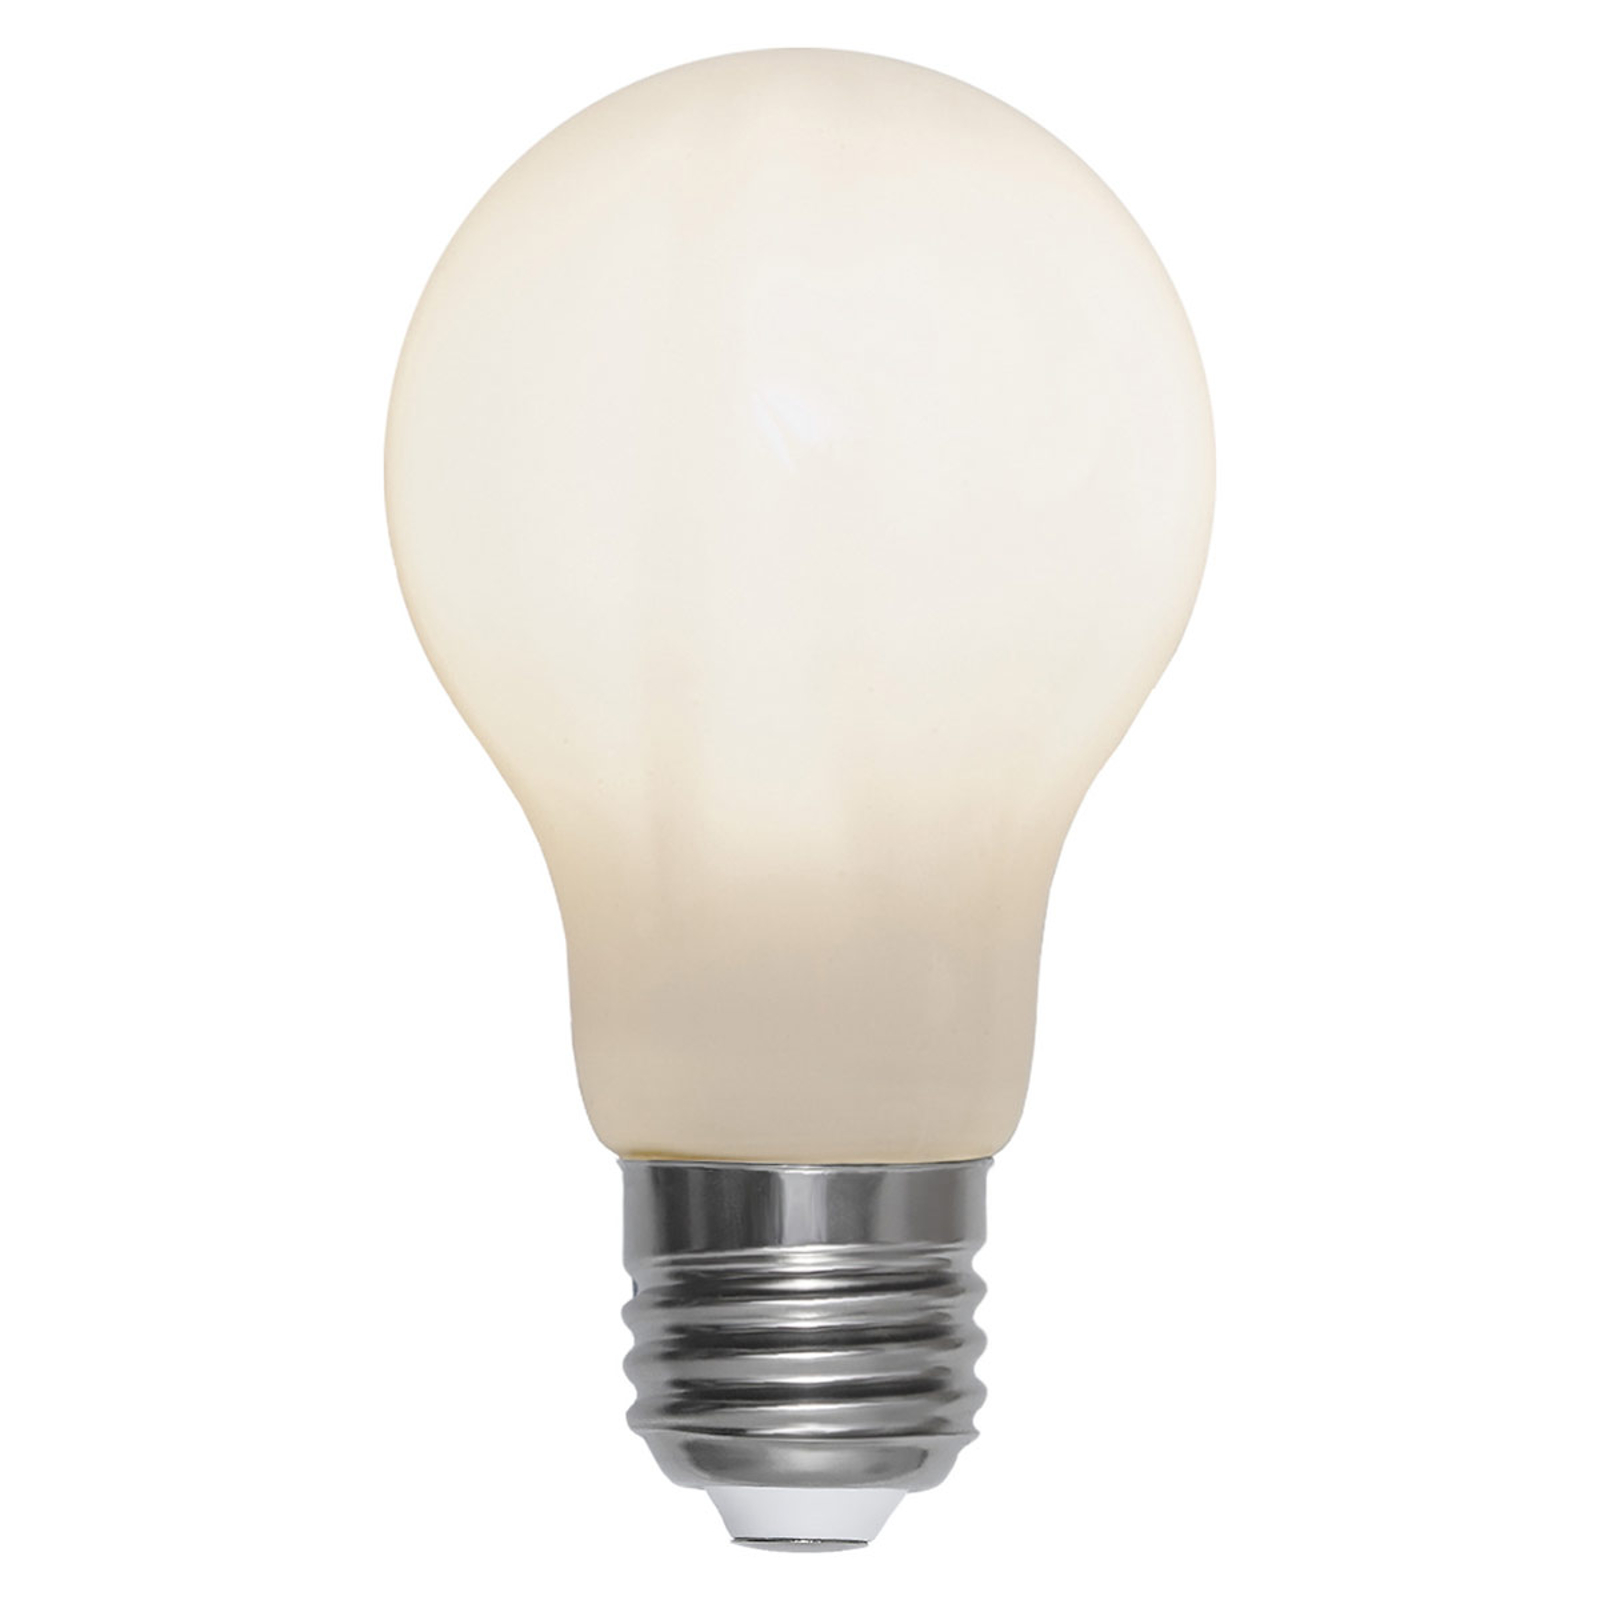 LED-Lampe E27 2.700K Ra90 opal 7,5W